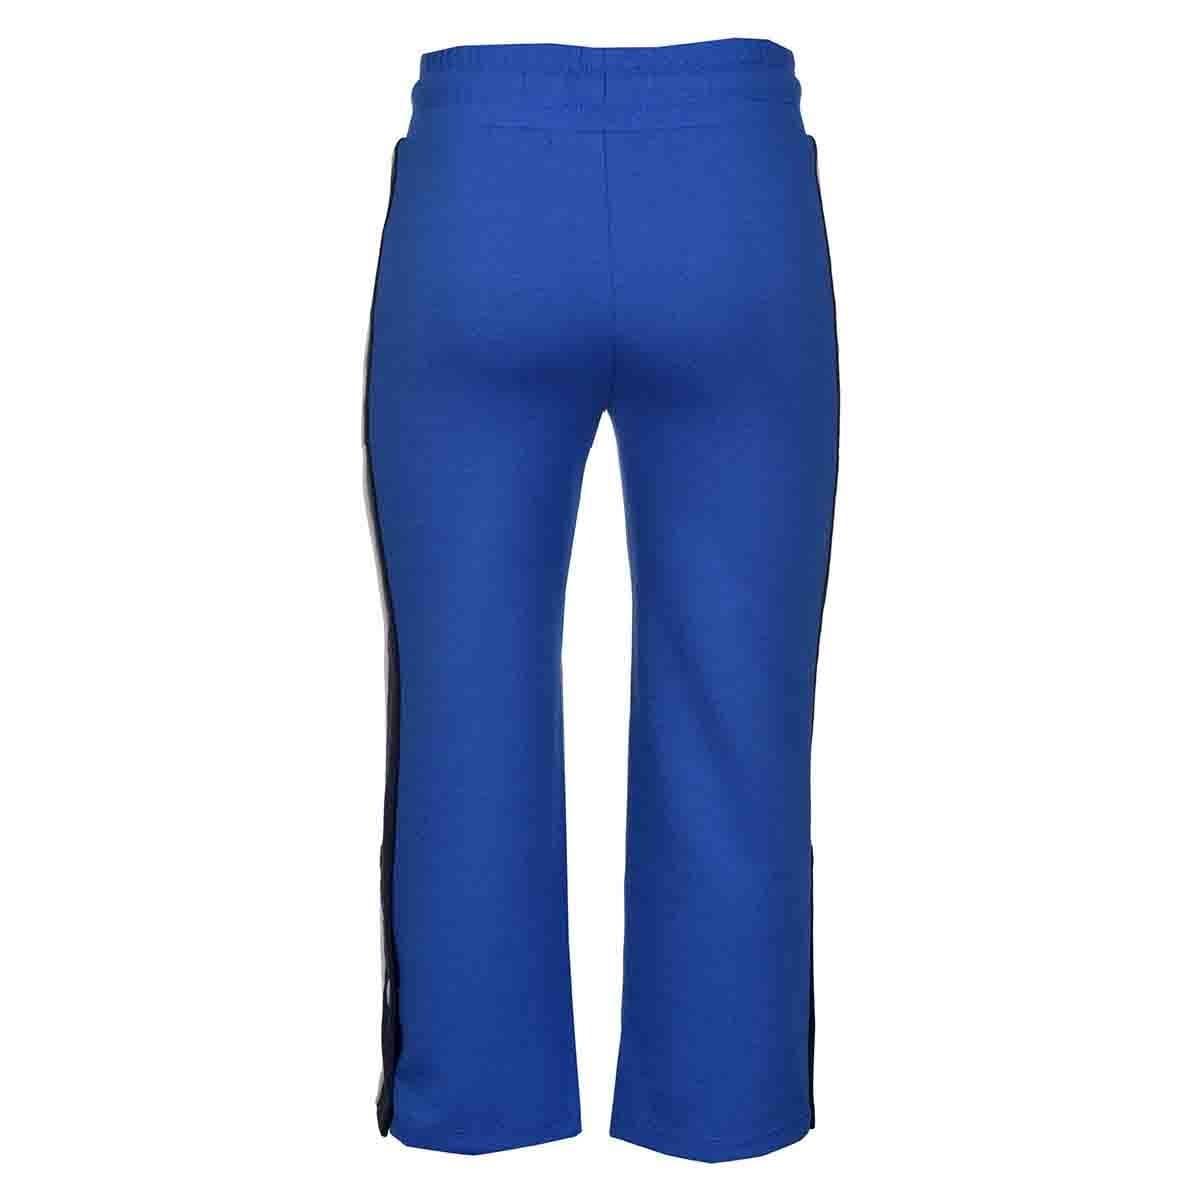 Pants con Broches Fukka